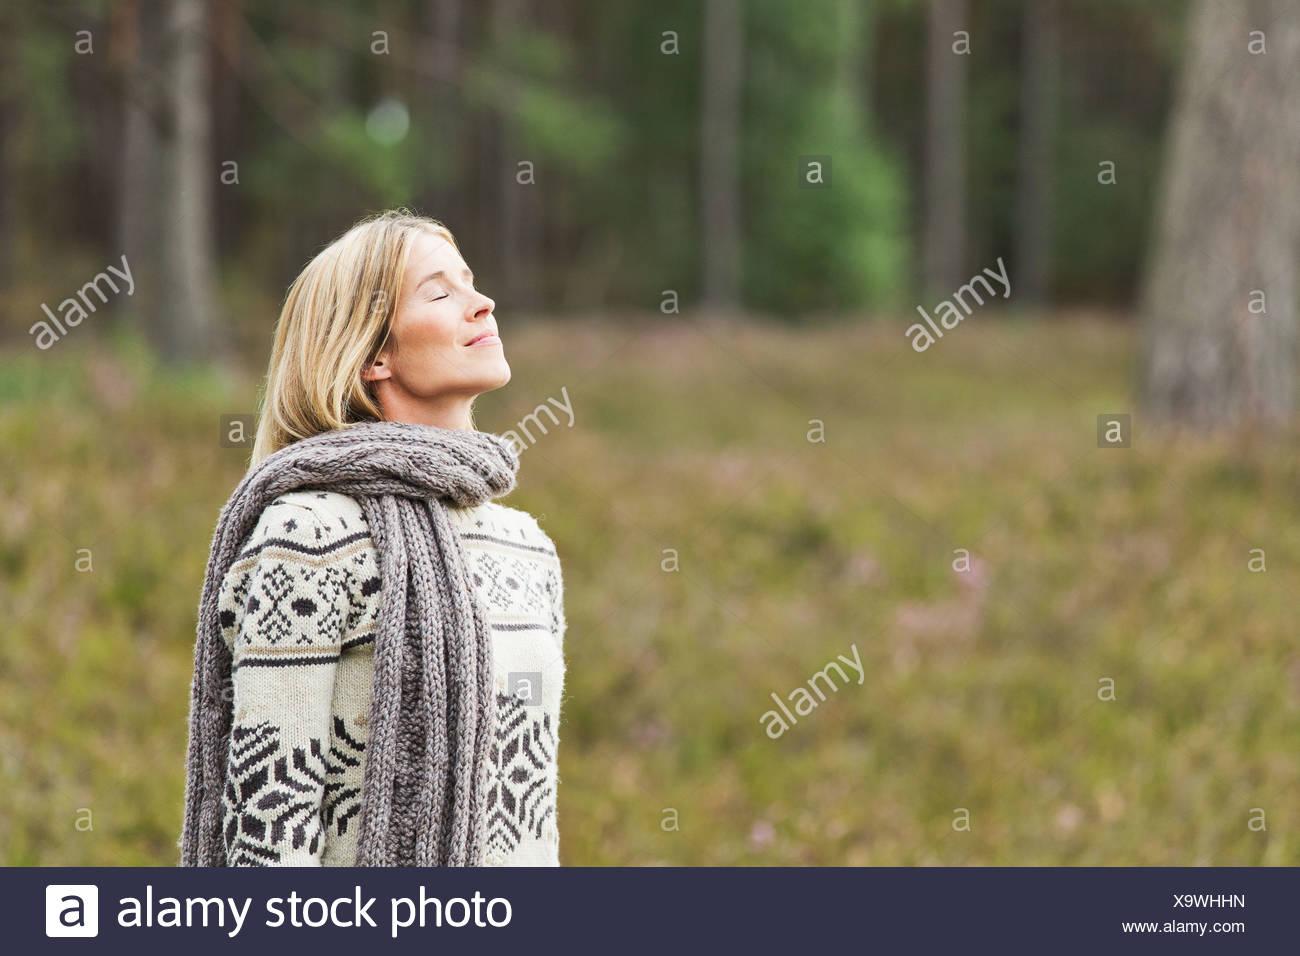 Mid adult woman wearing sweater avec les yeux fermé Photo Stock